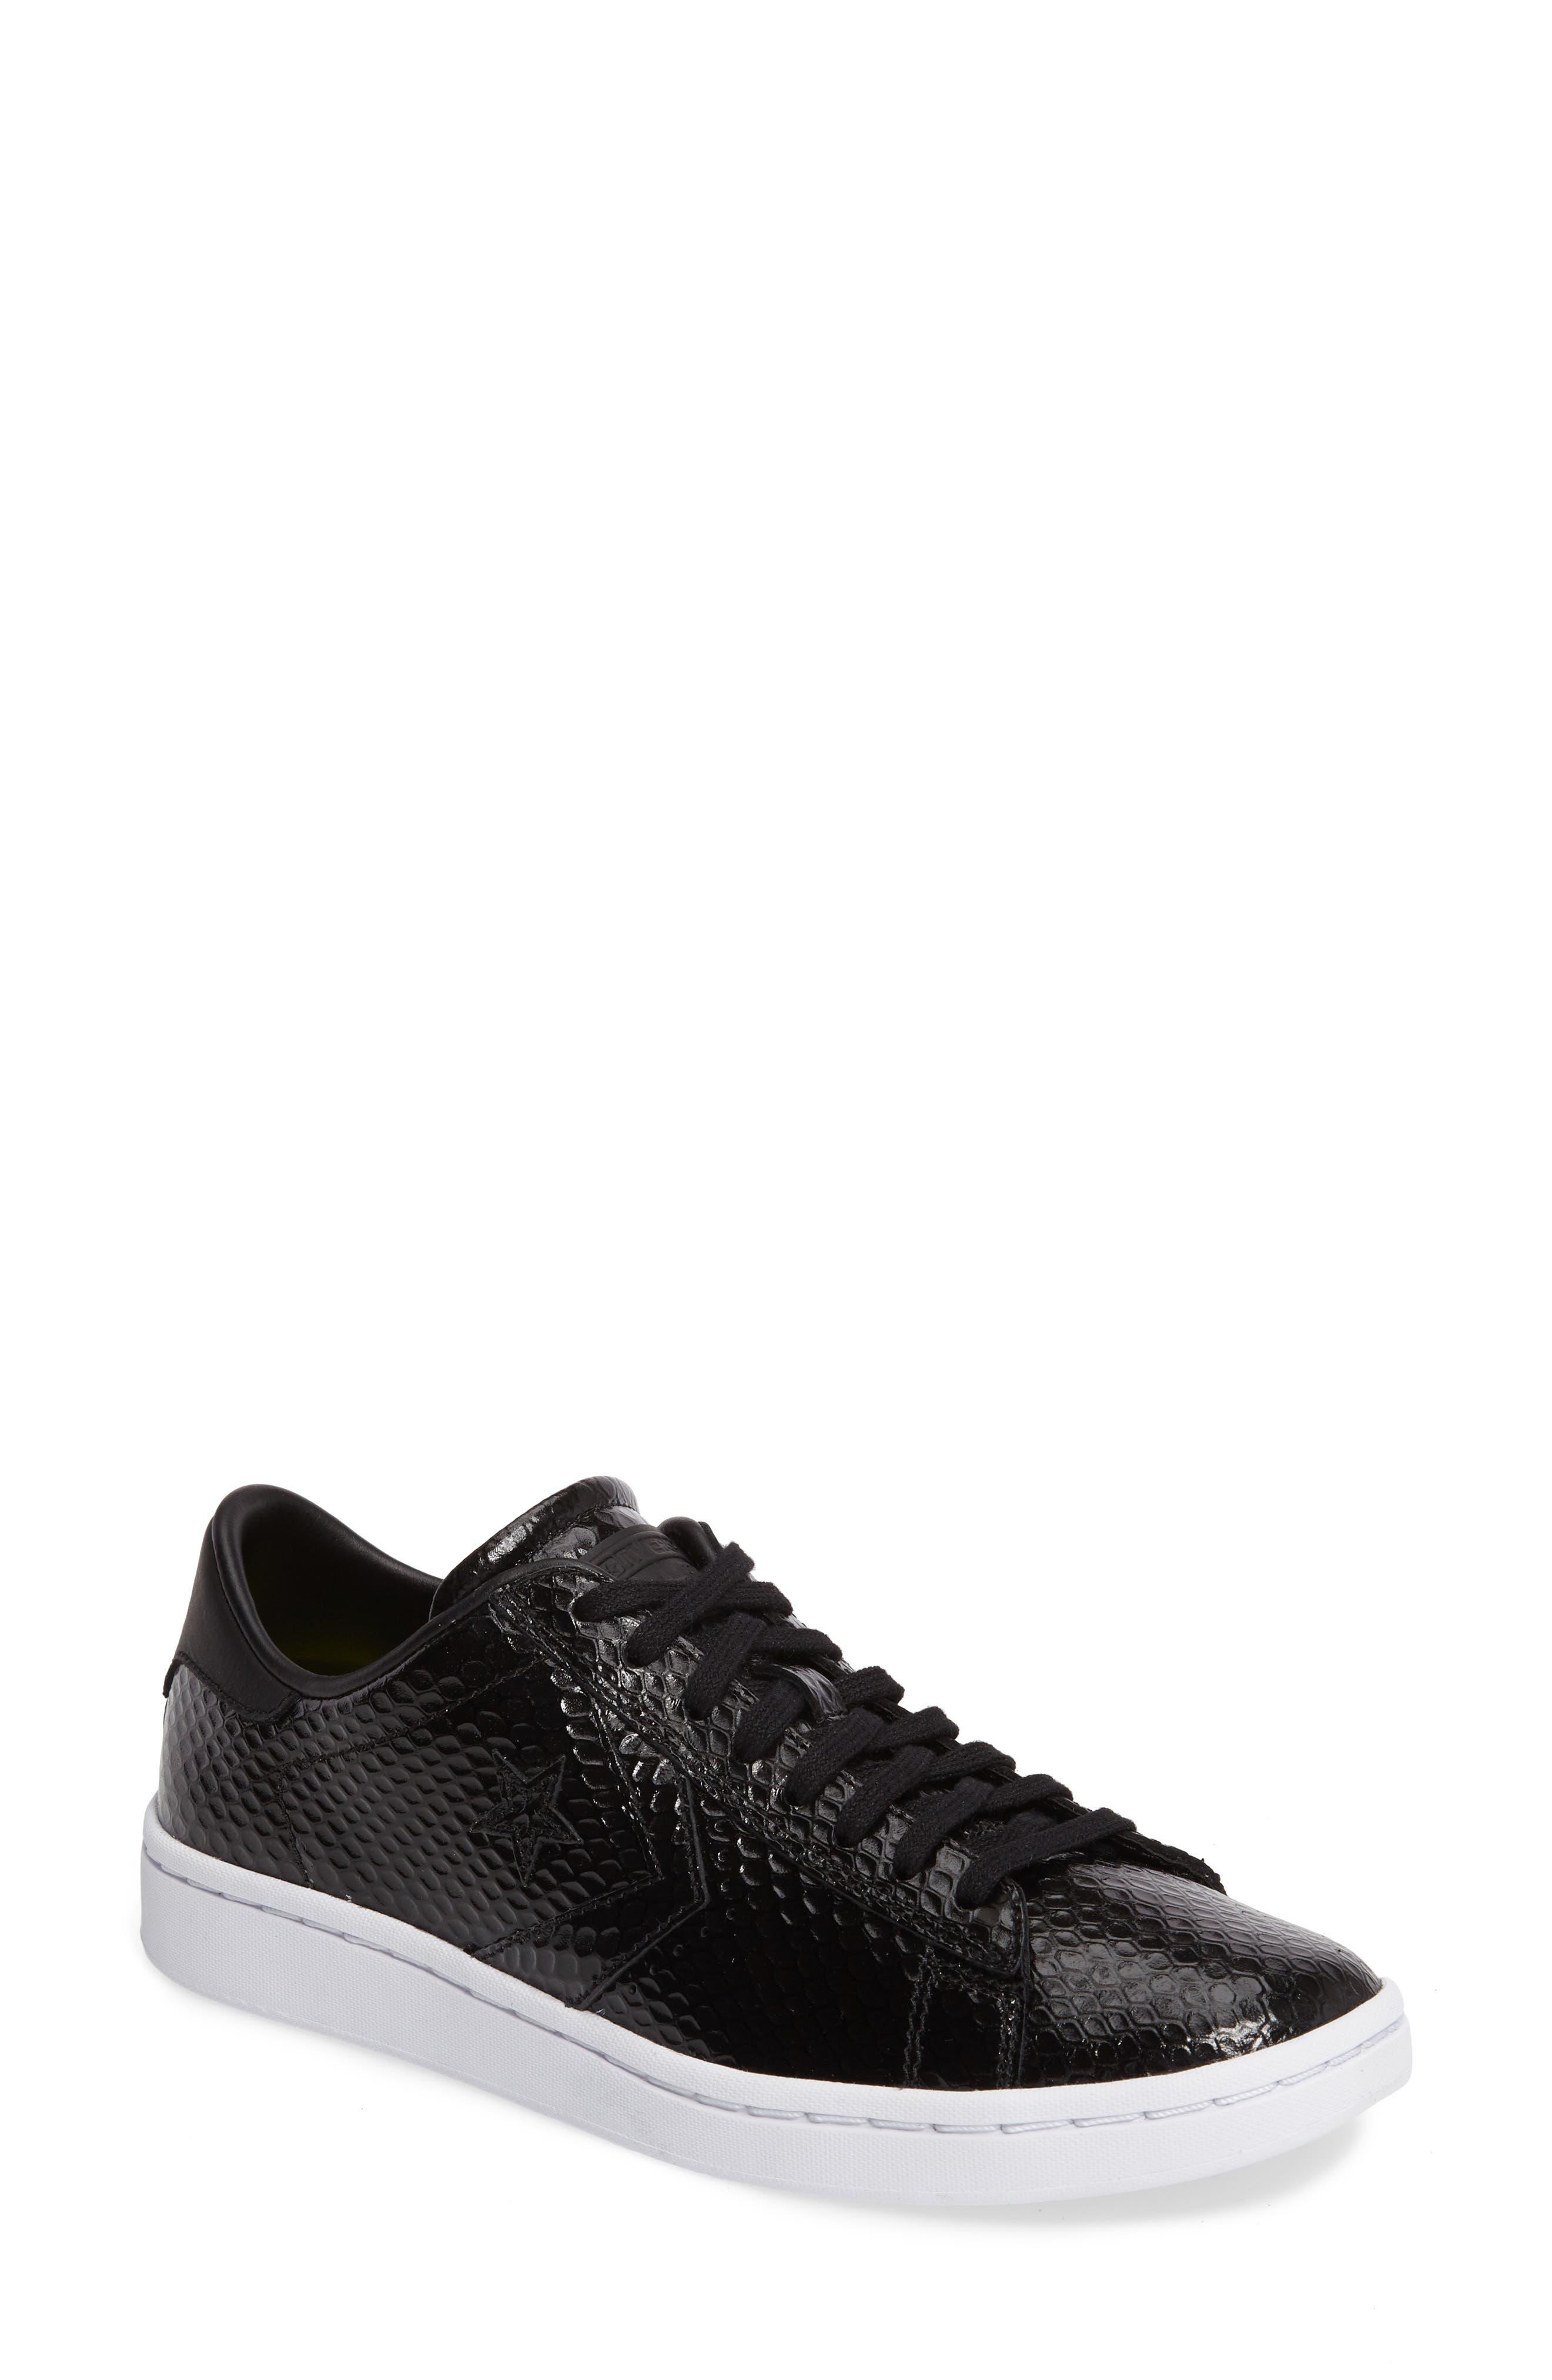 Main Image - Converse® Pro LP Sneaker (Women)